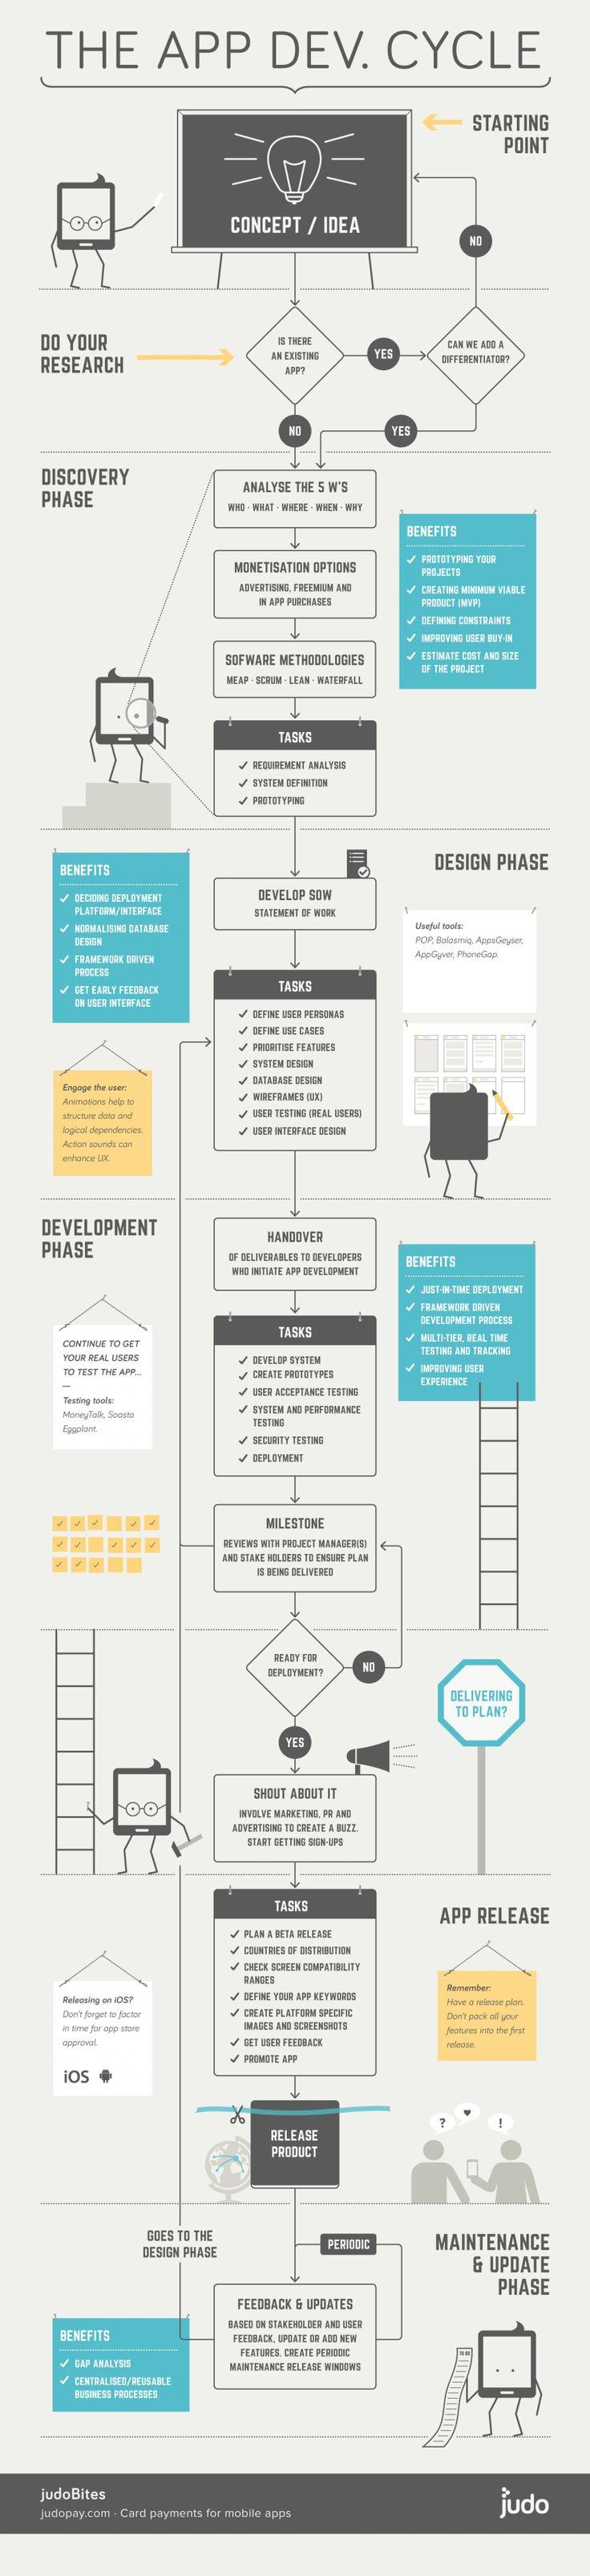 mobile application development lab programs